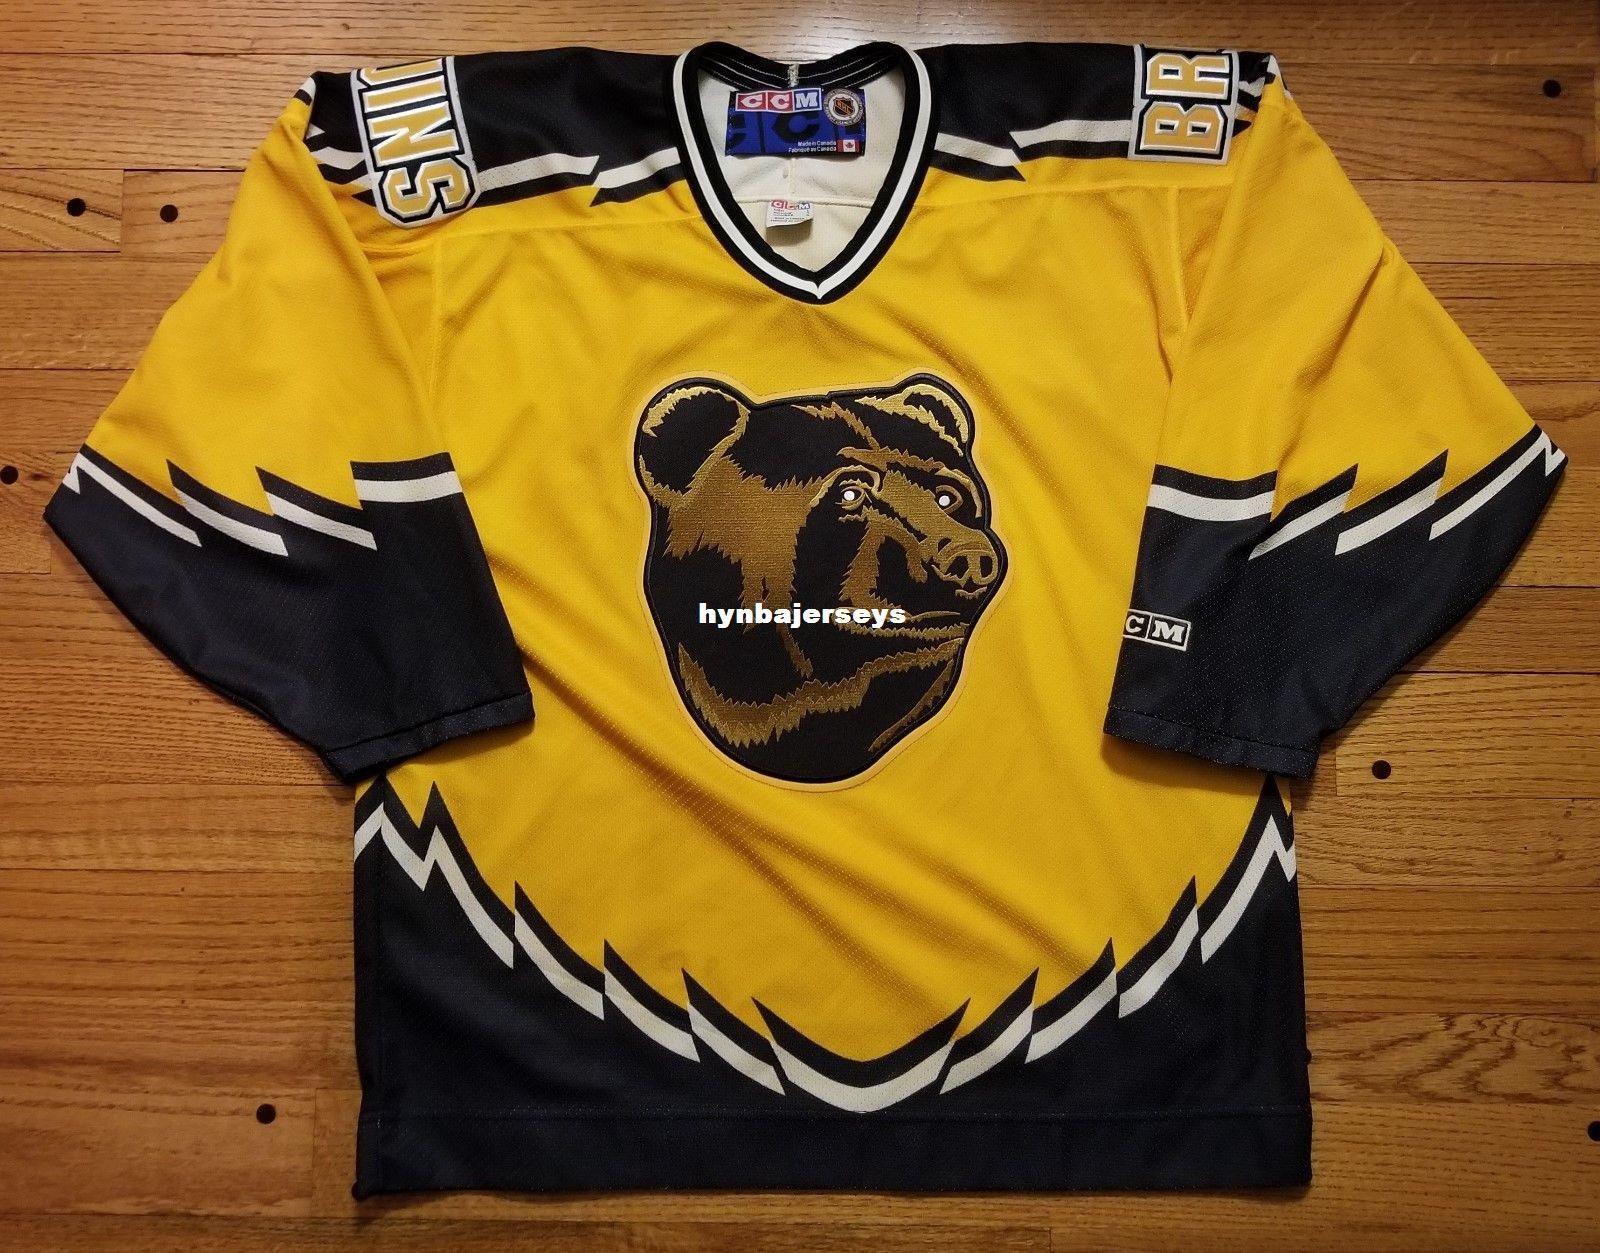 79ec608edbe ... top quality 2019 custom boston bruins vintage ccm cheap hockey third  jersey yellow pooh bear mens